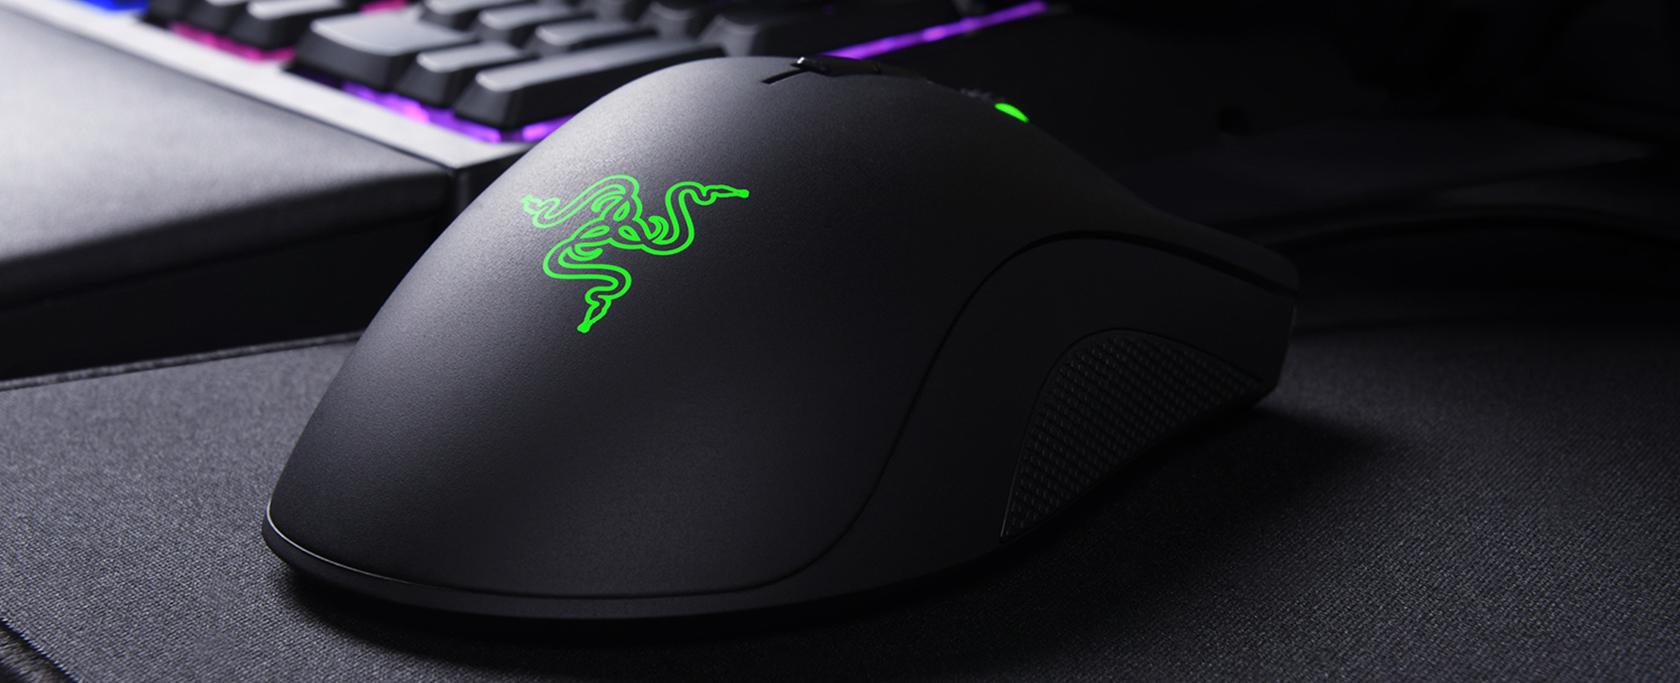 Mouse Razer Deathadder Elite, será que vale a pena?